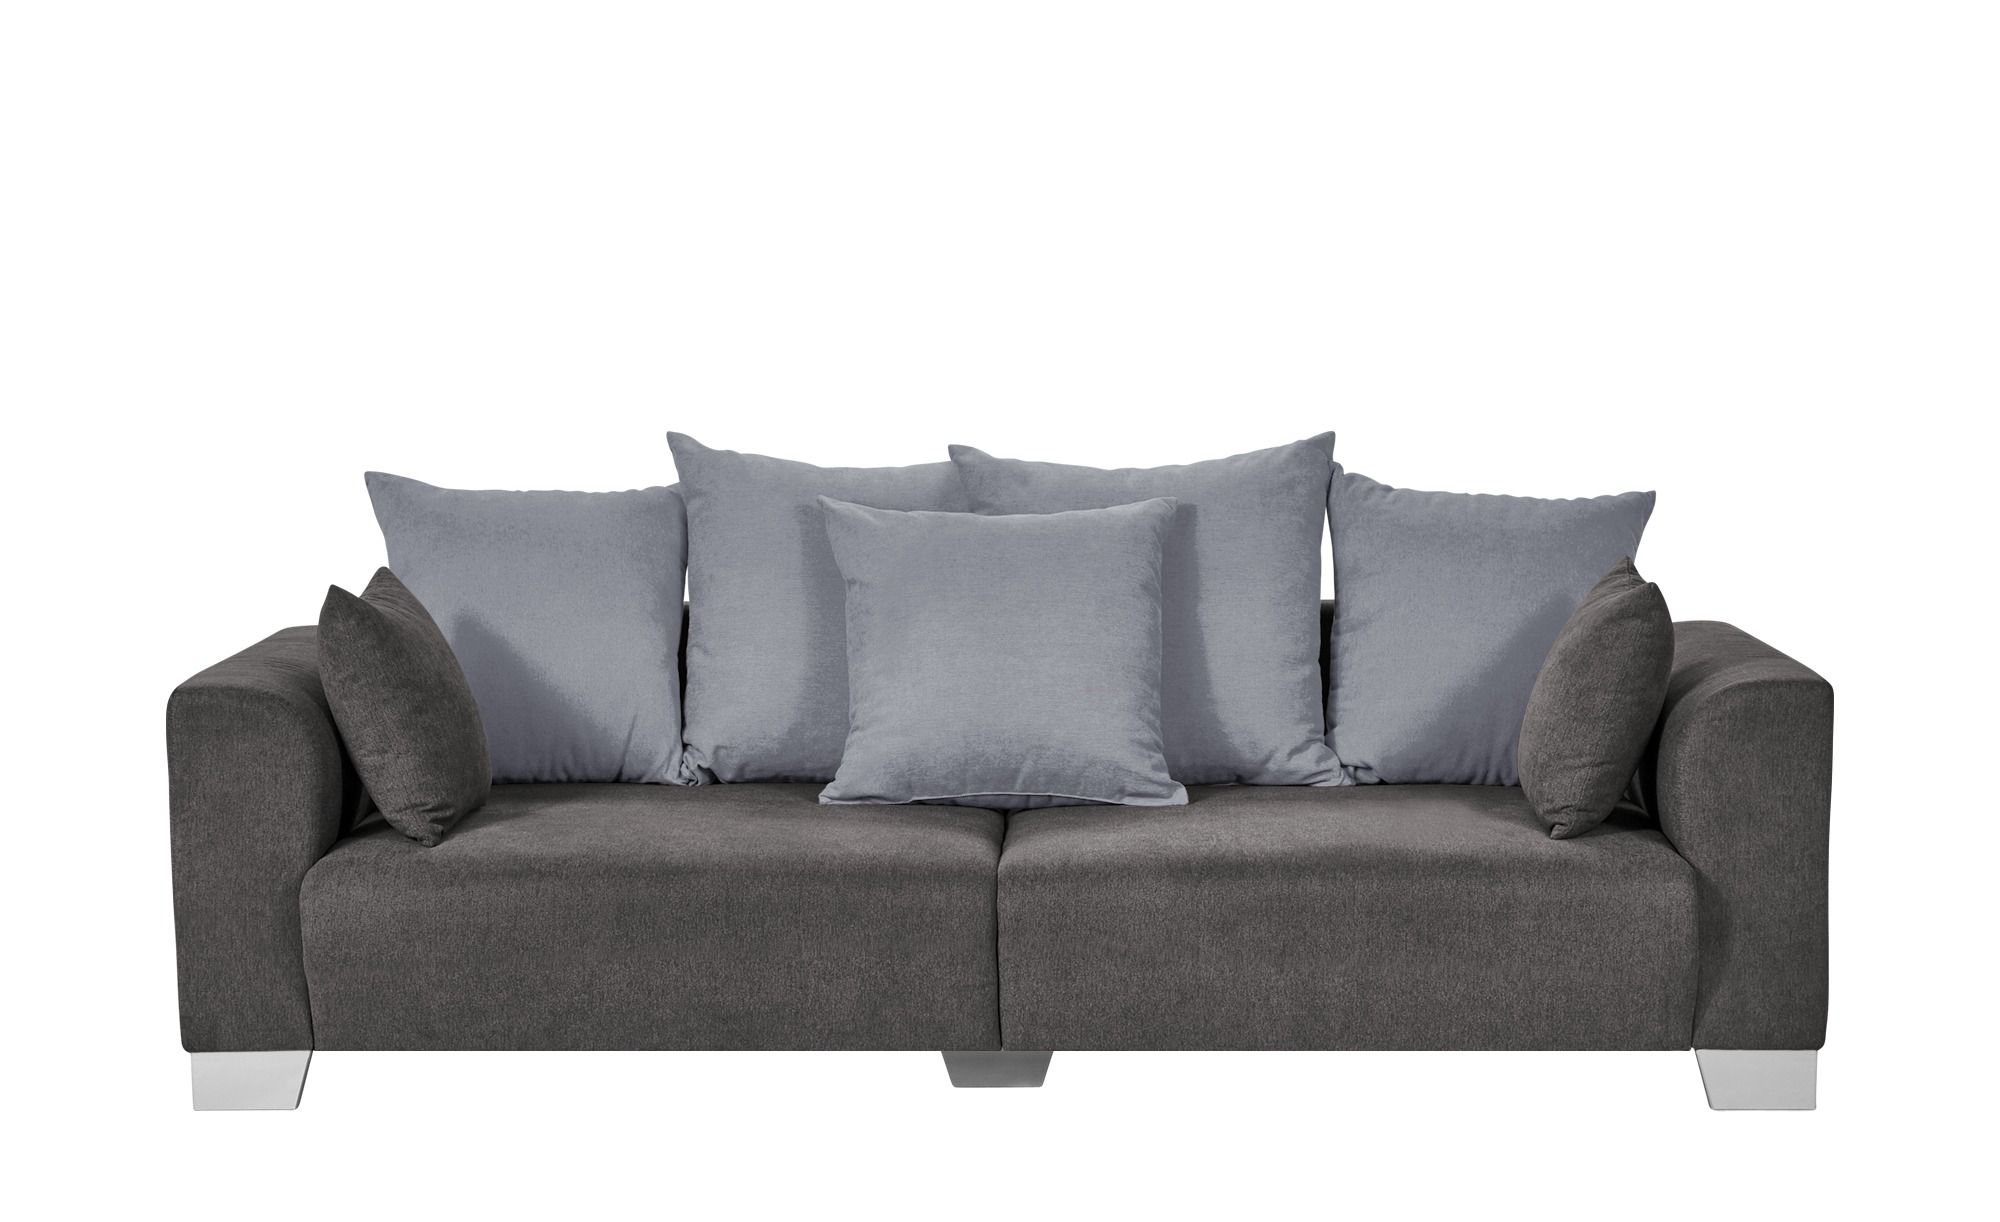 Smart Big Sofa Grau Braun Flachgewebe Tonja Grosse Sofas Sofa